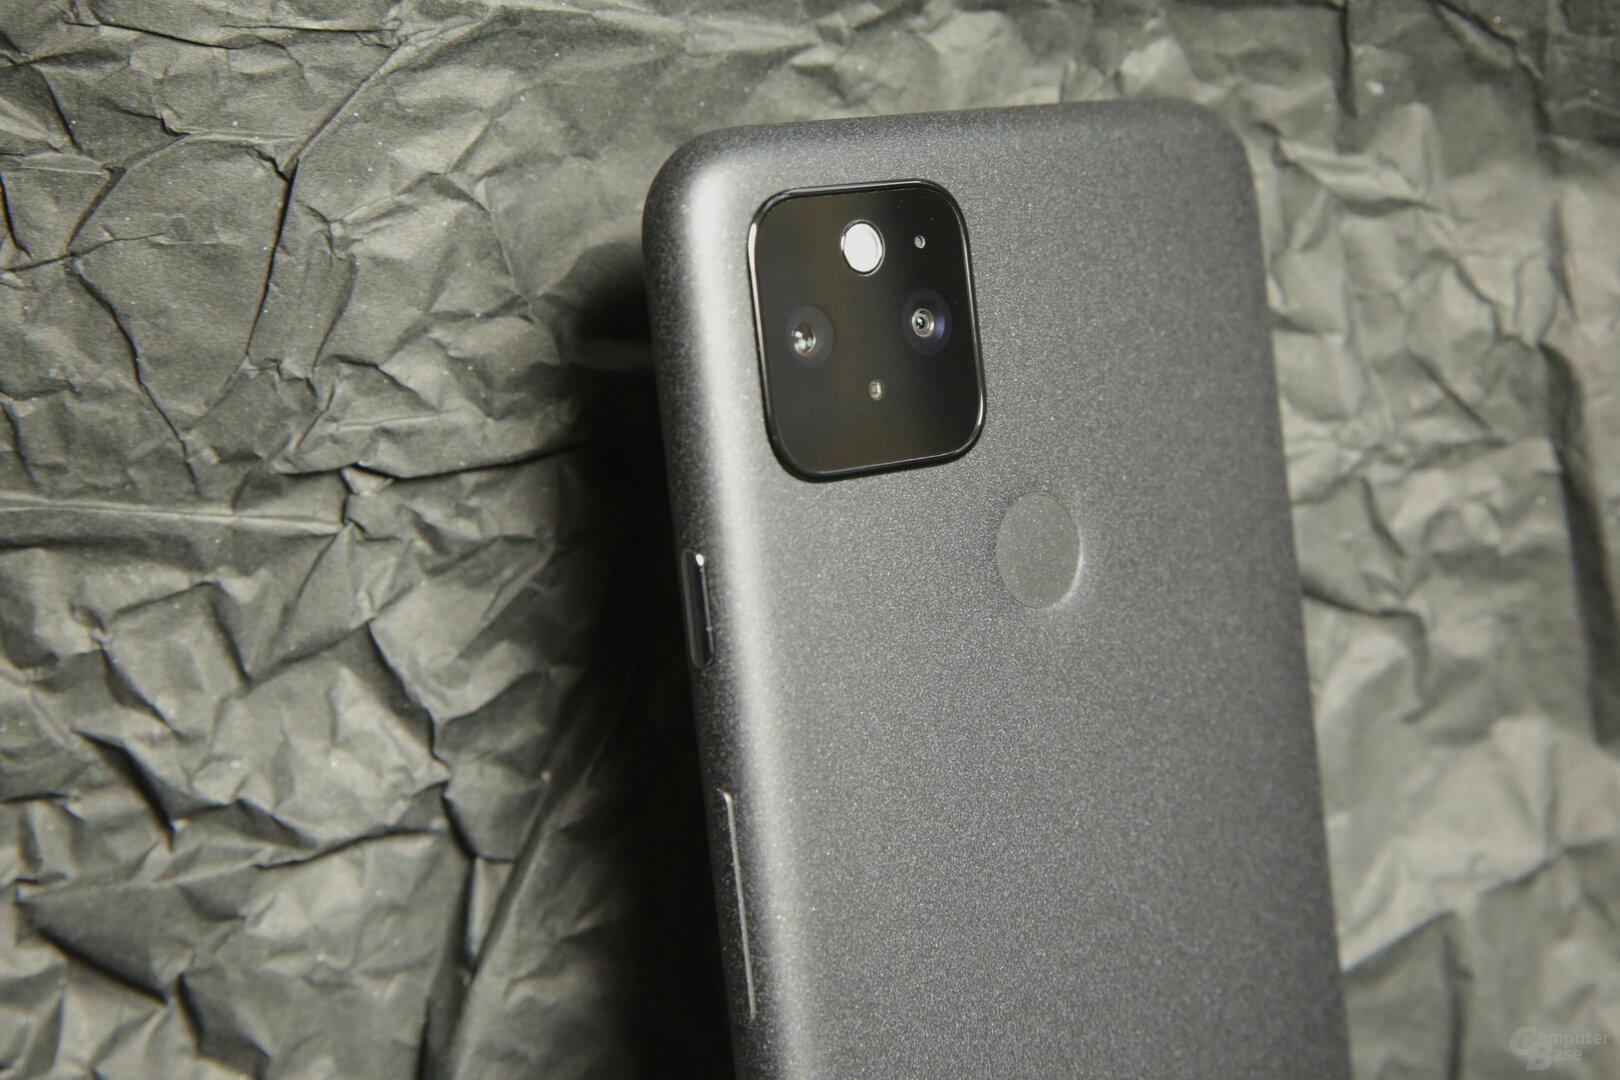 Neue Dual-Kamera mit Ultraweitwinkelobjektiv